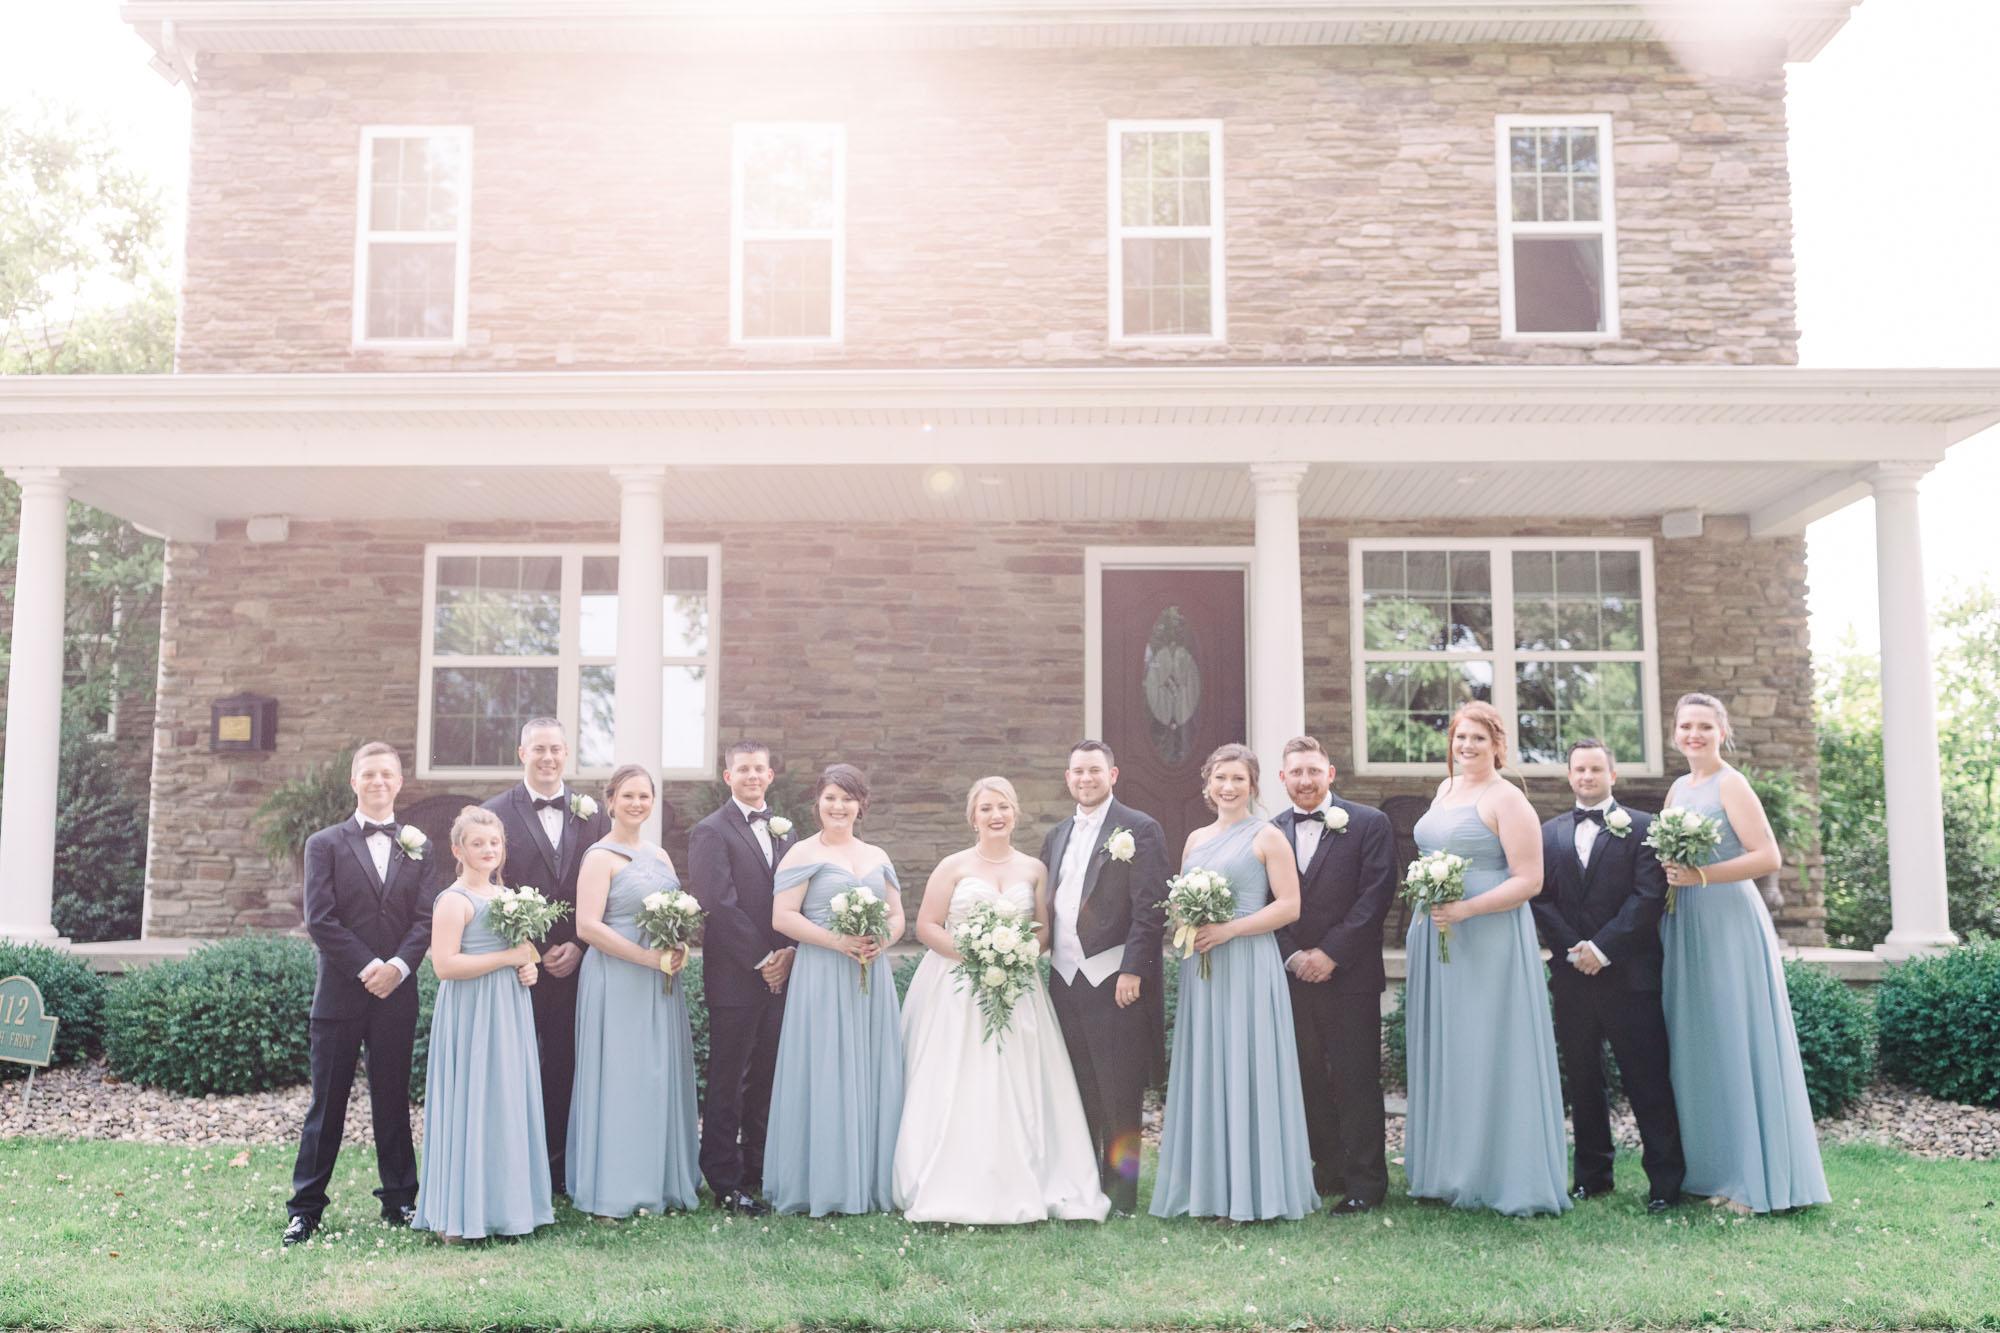 isle-of-que-wedding-6802.jpg